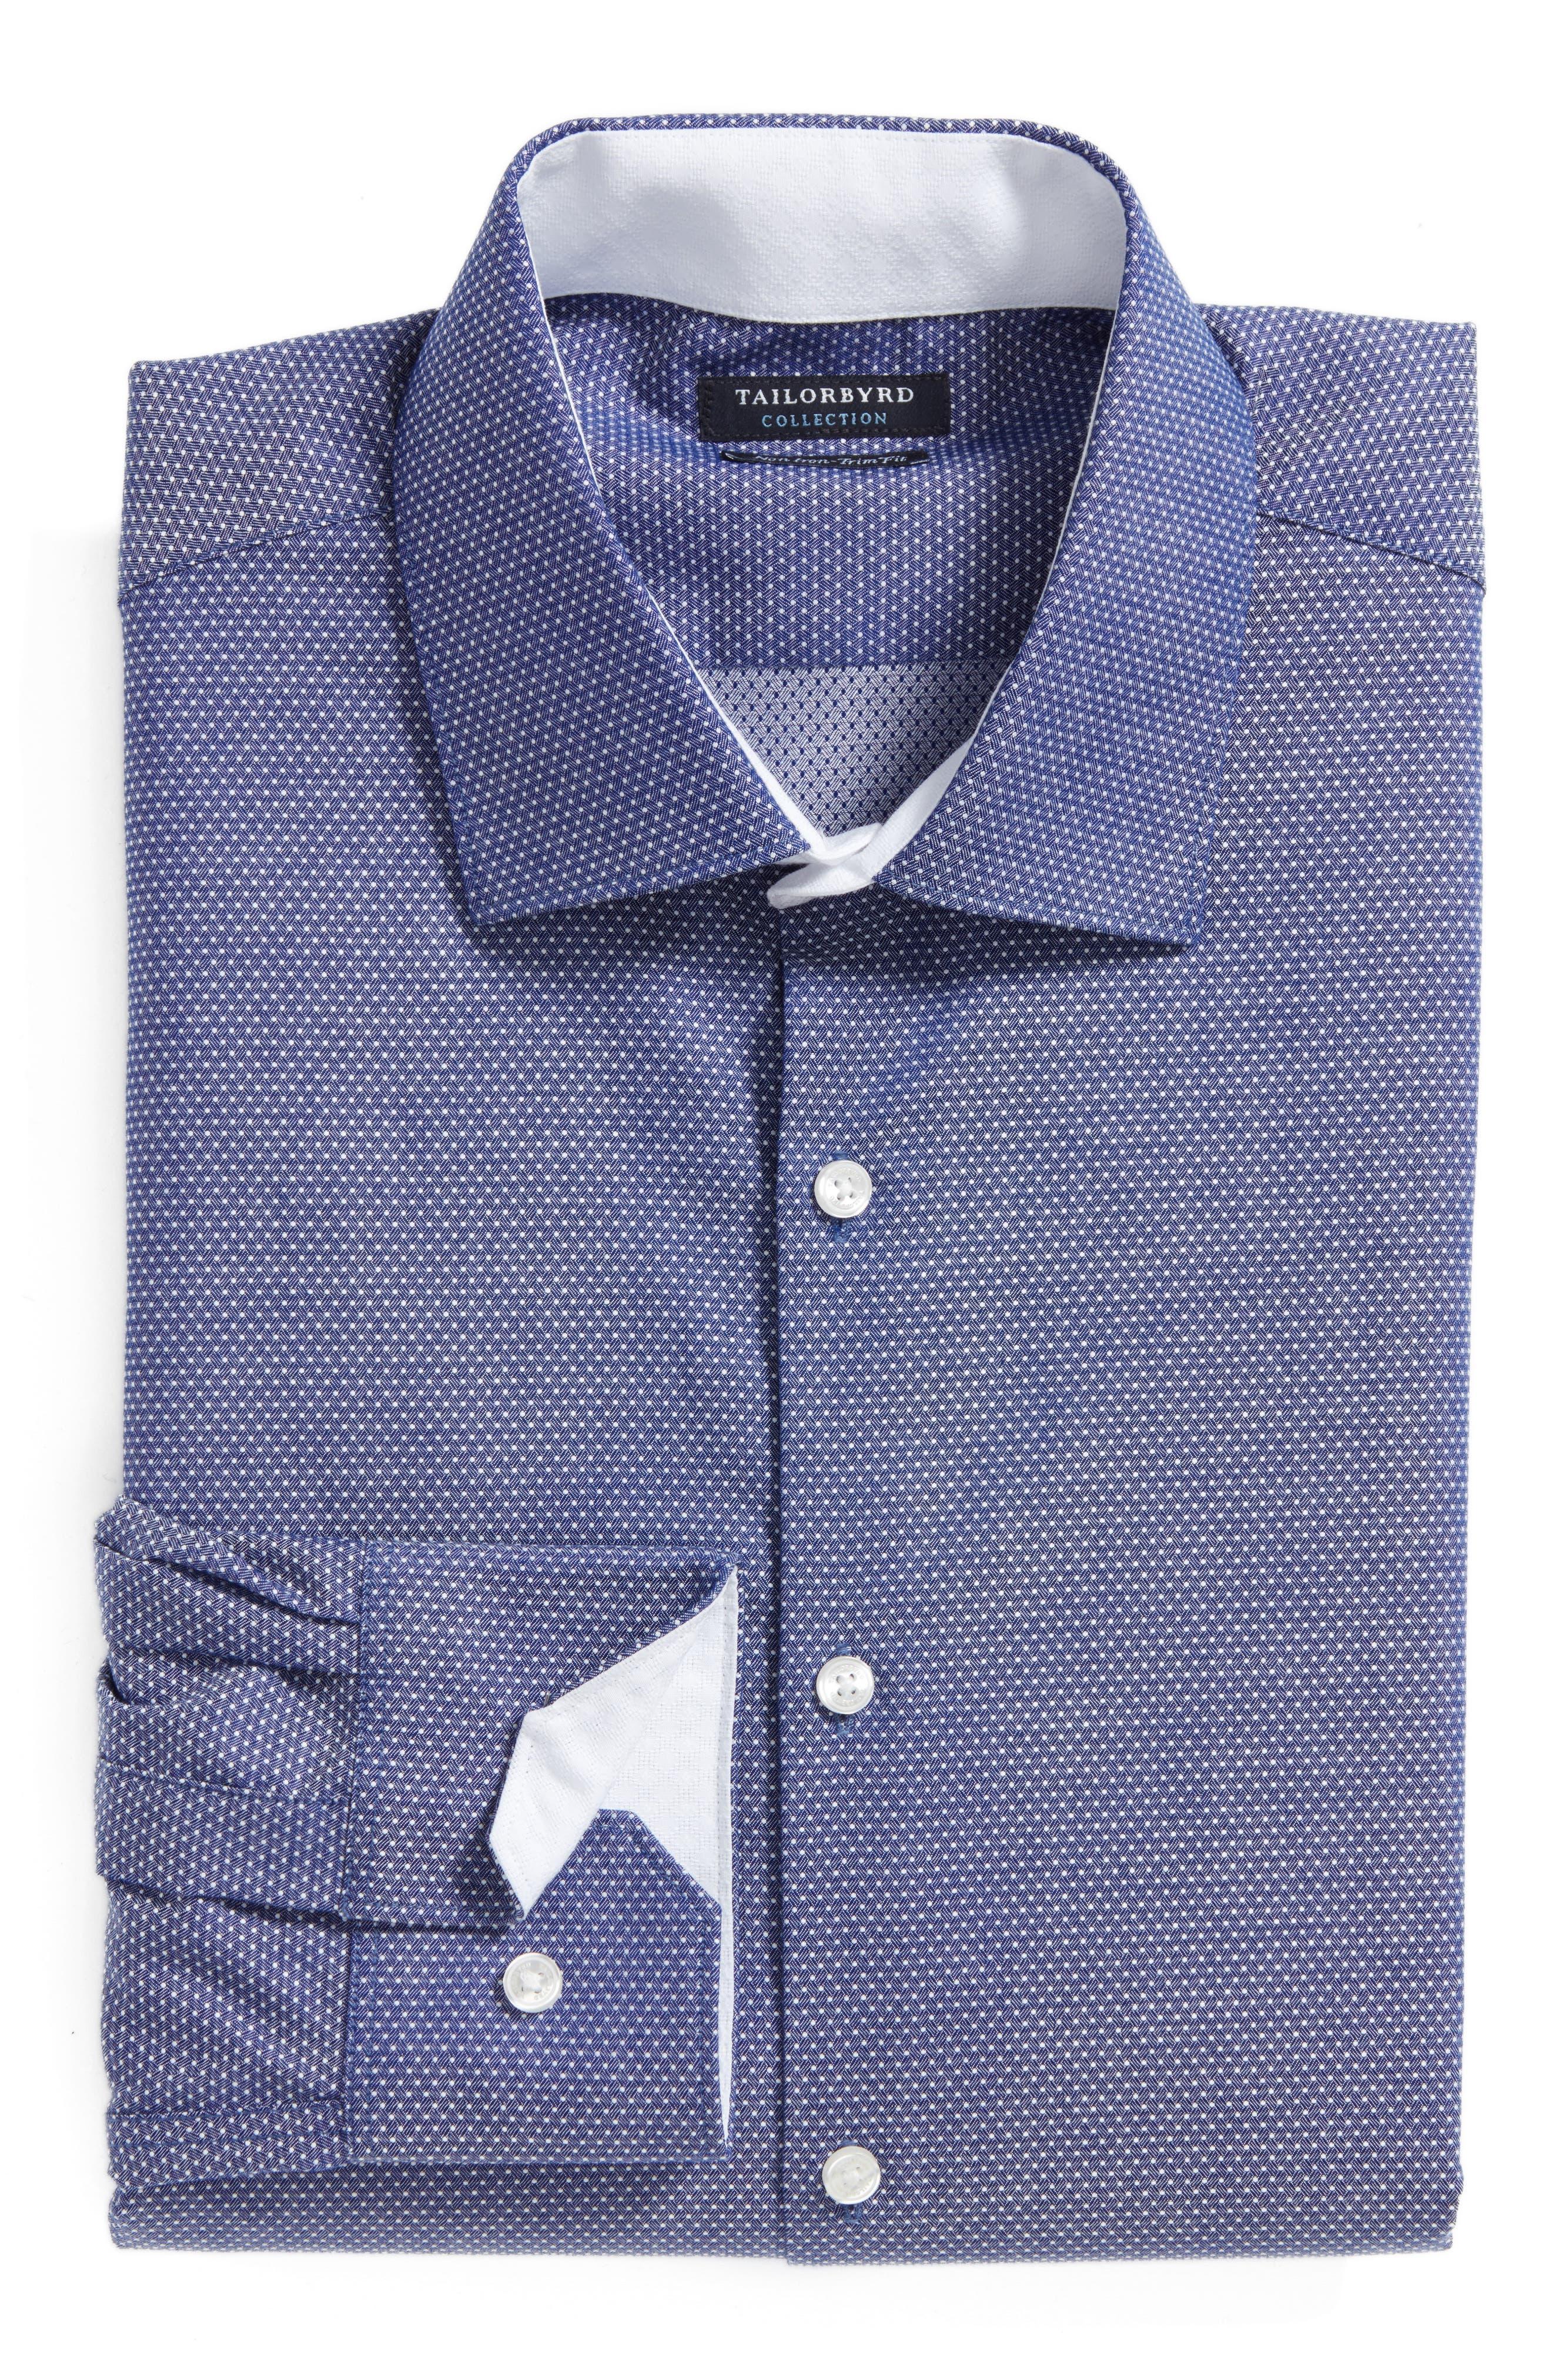 Eden Isle Trim Fit Non-Iron Geometric Dress Shirt,                             Main thumbnail 1, color,                             410